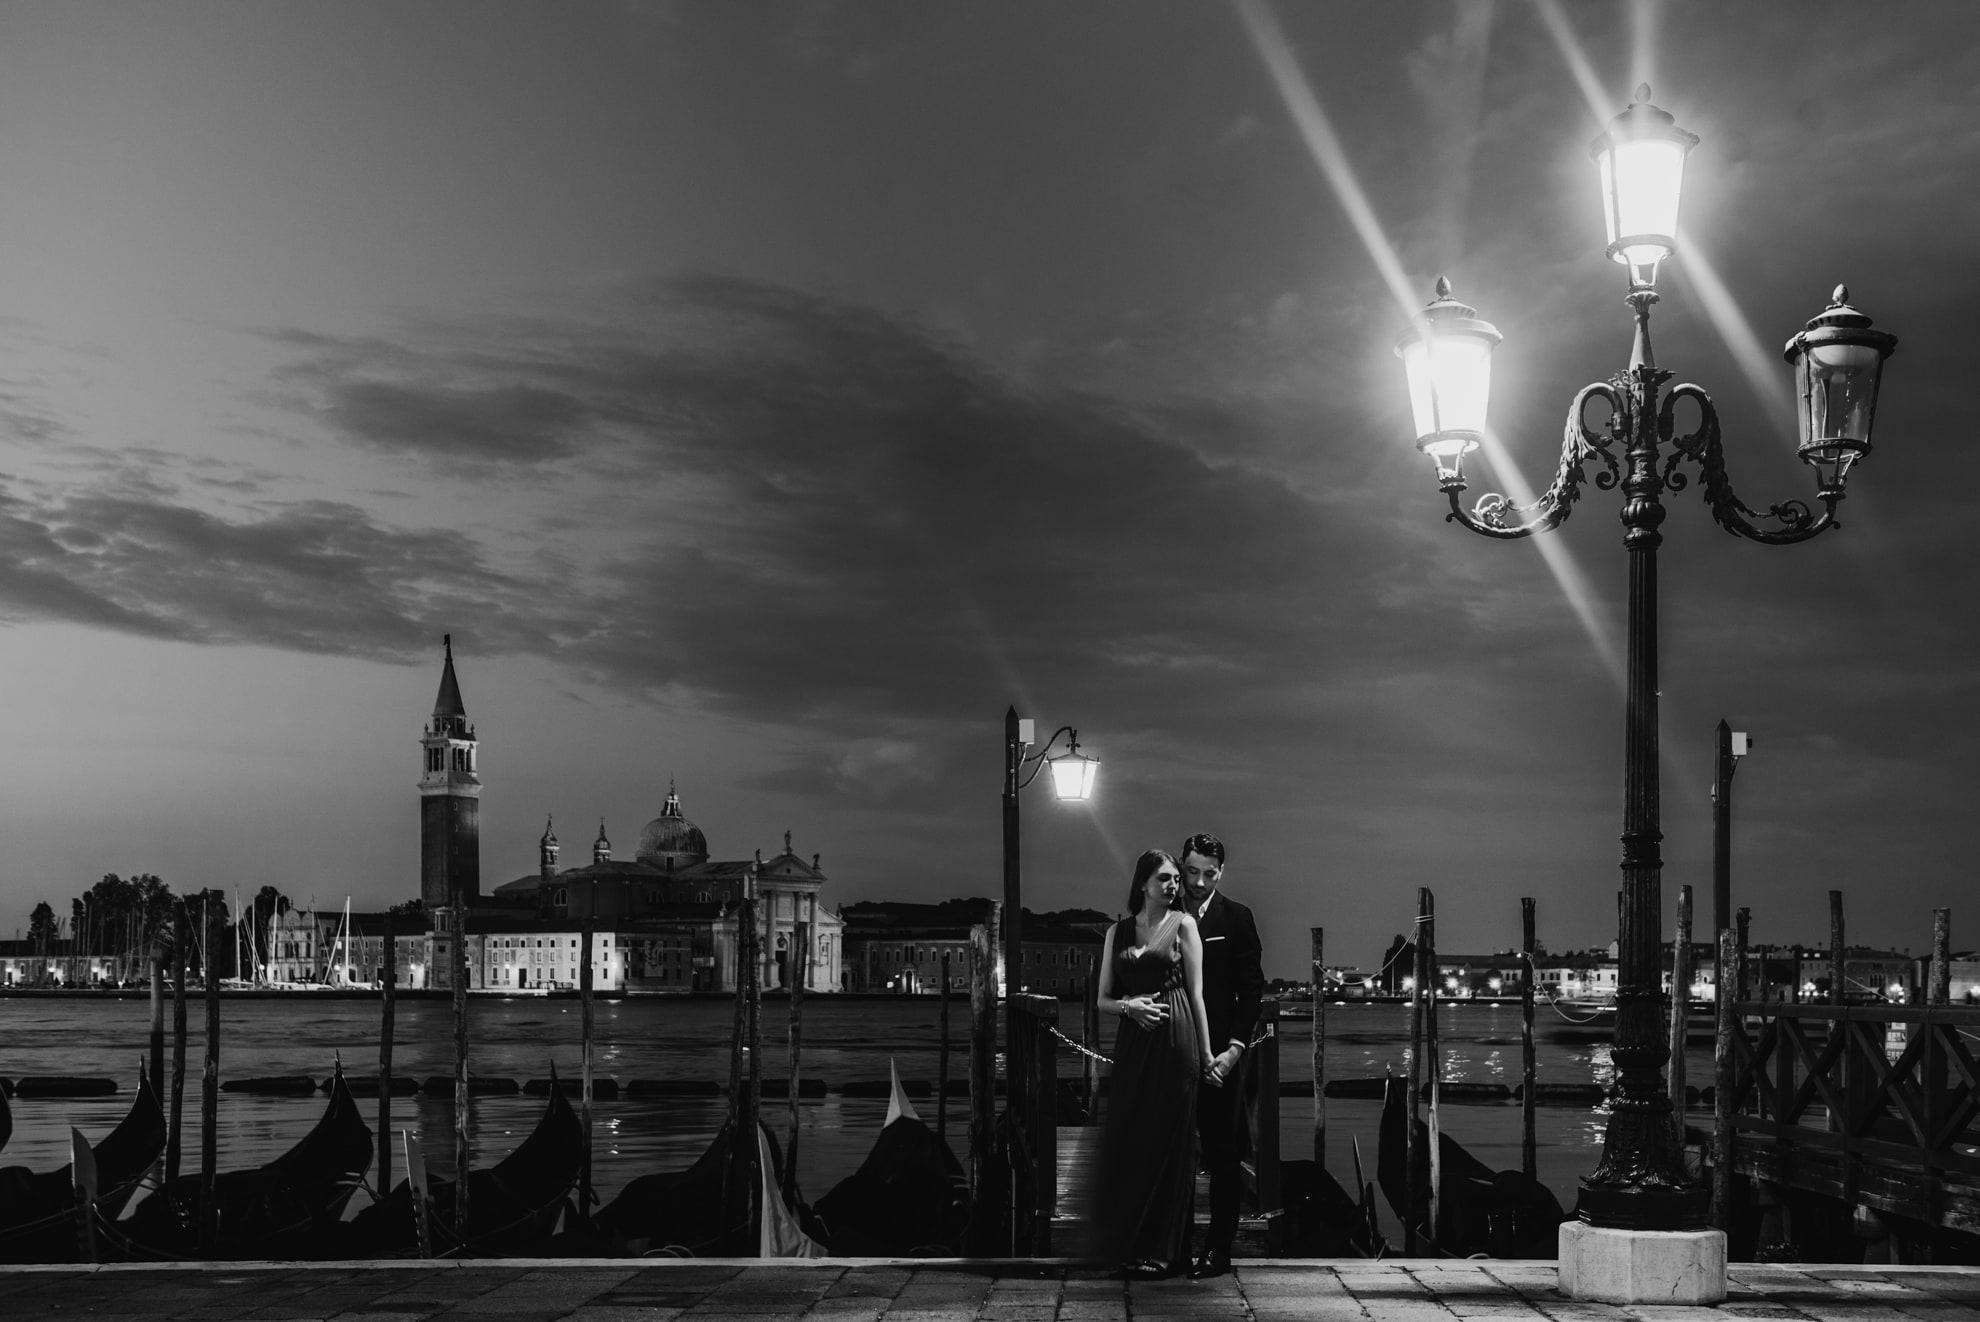 engagement venice venezia proposal proposta matrimonio fidanzamento irene pollacchi fotografa 17